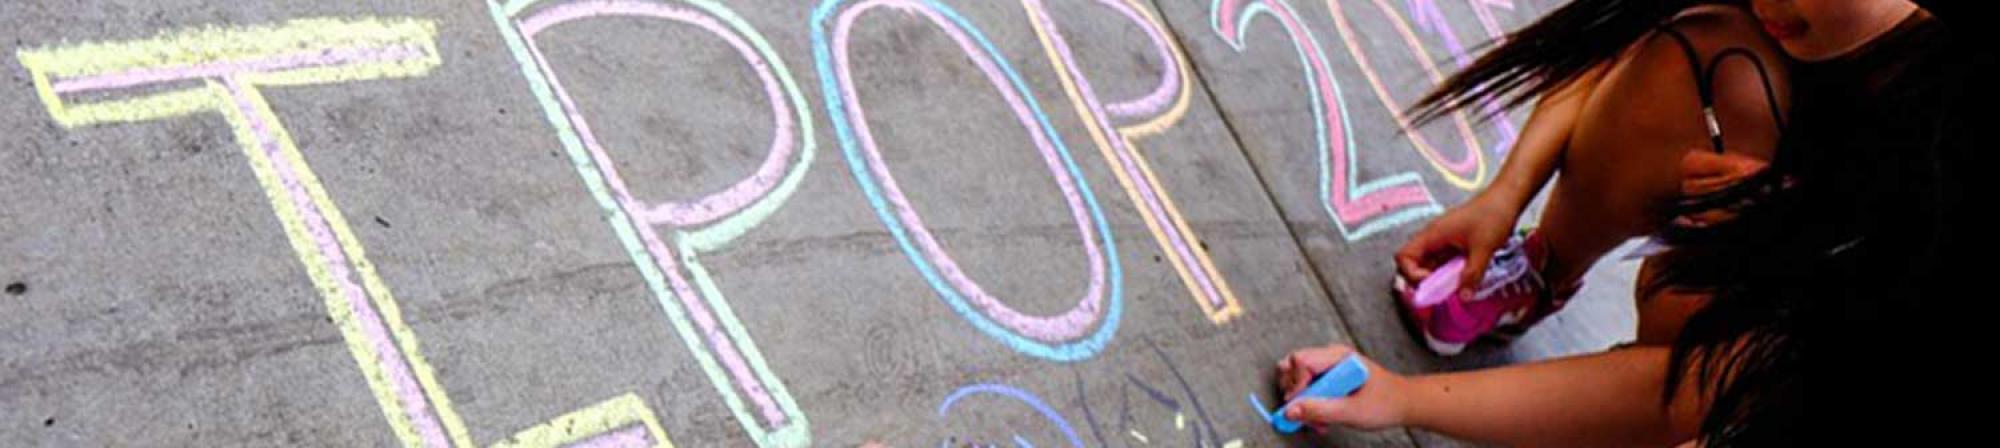 "Students draw ""IPOP 2016"" in sidewalk chalk"